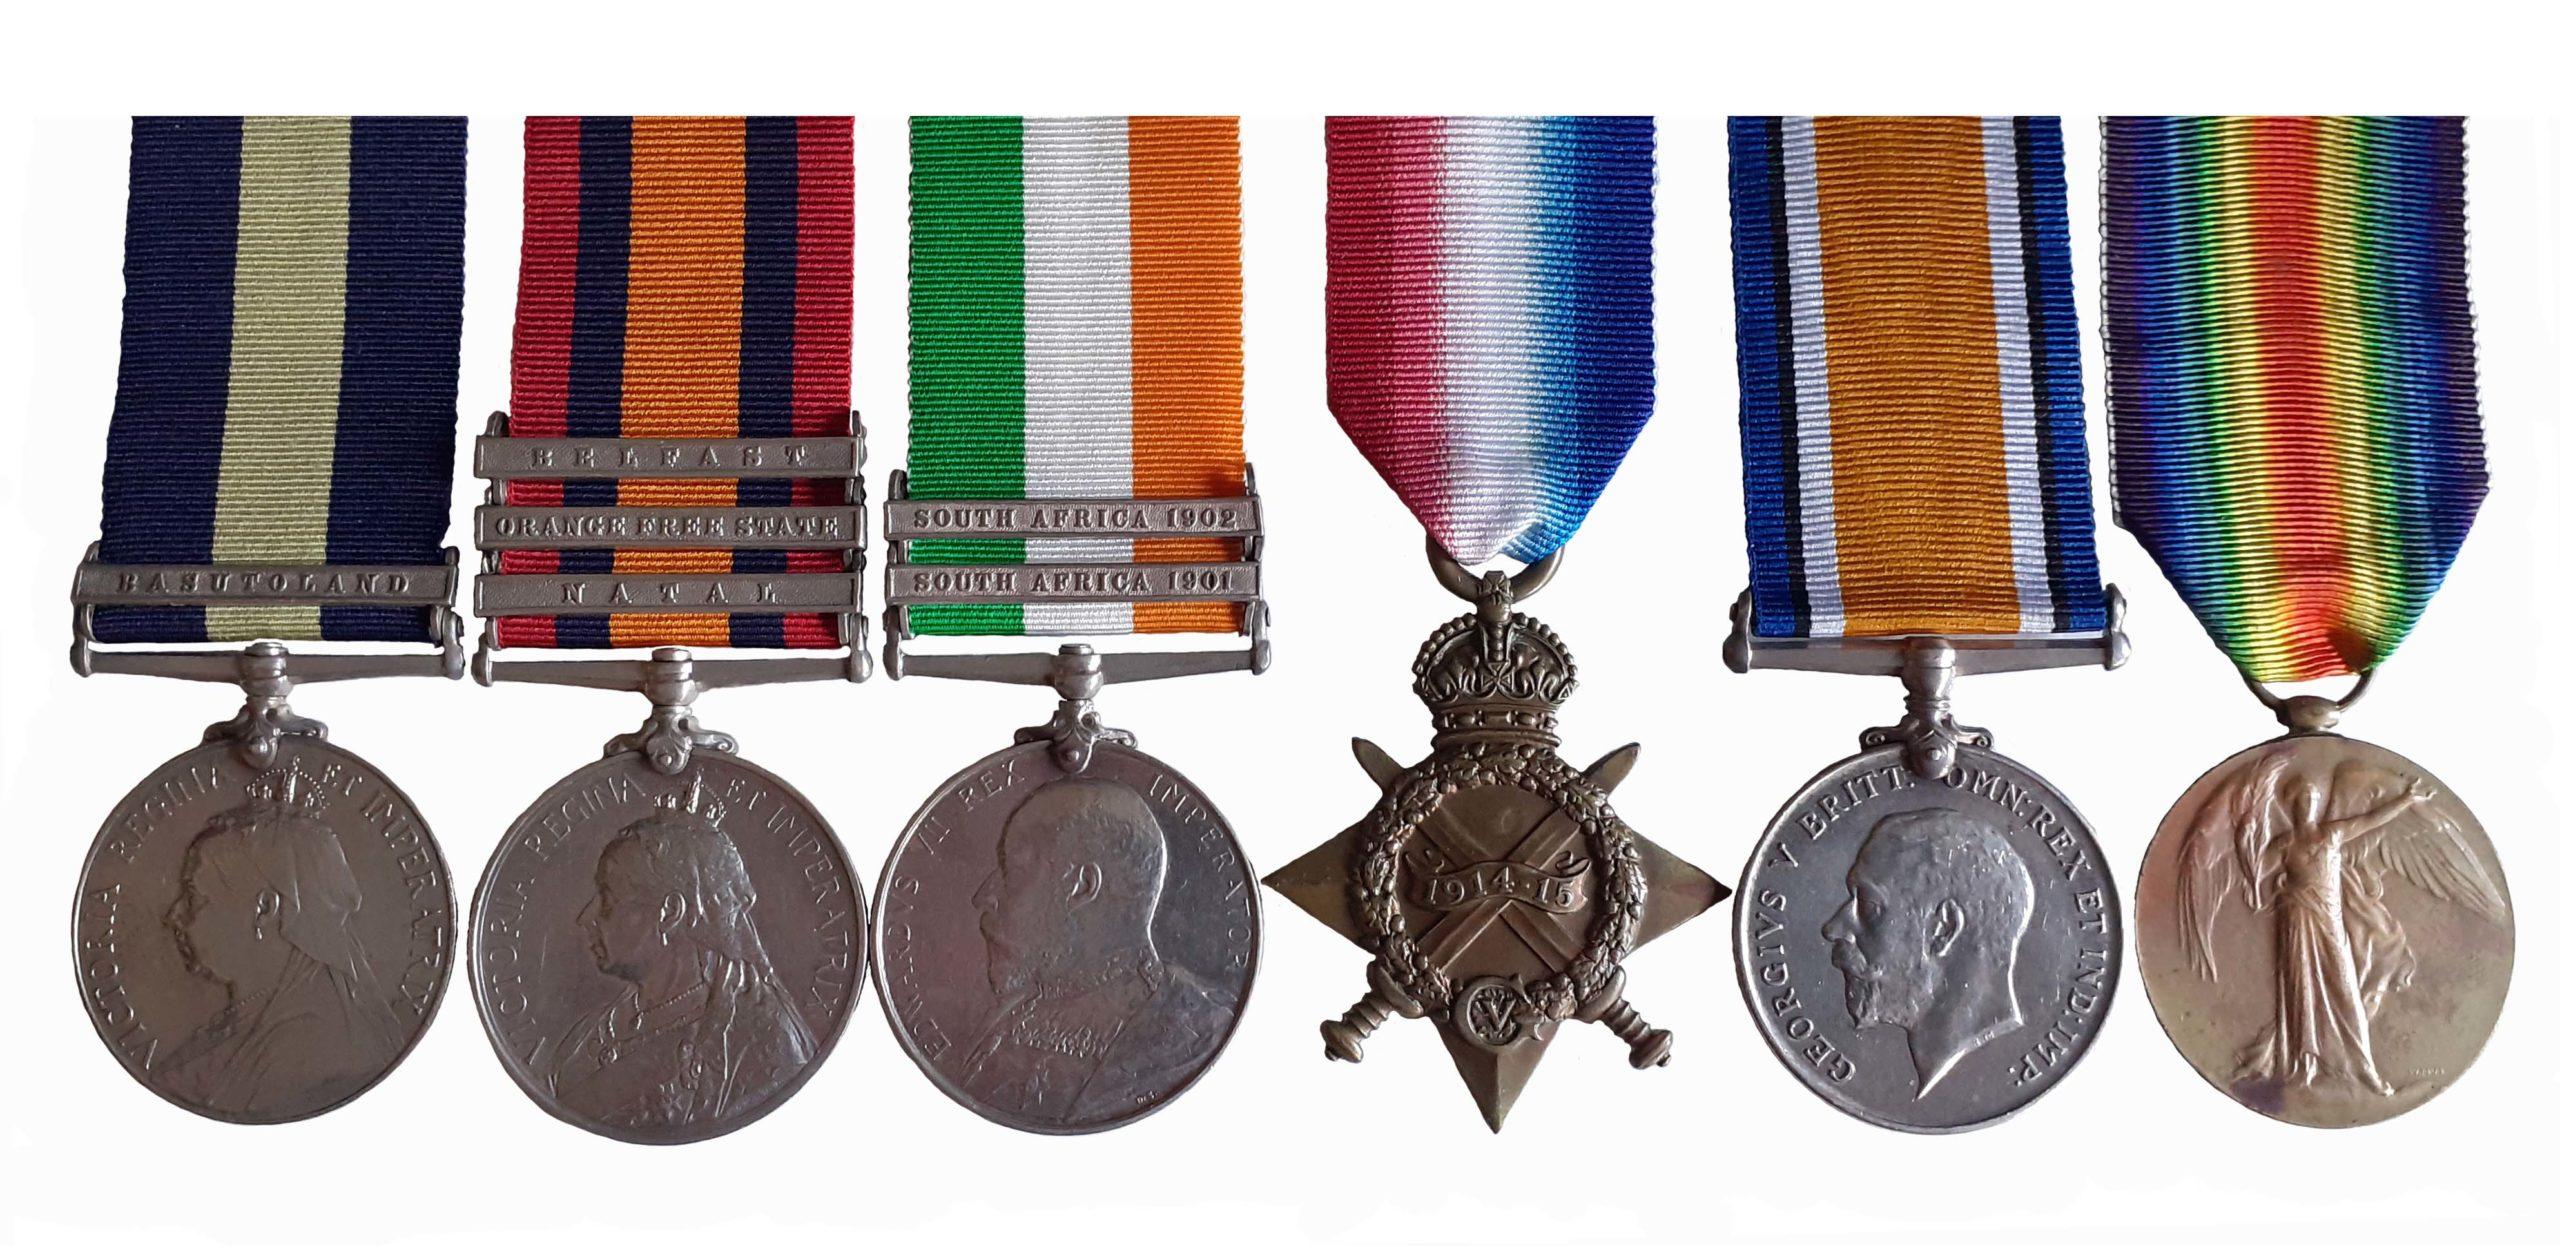 A Cape of Good Hope, Boer War, Great War Group of 6 to Captain Francis Disney Herbert